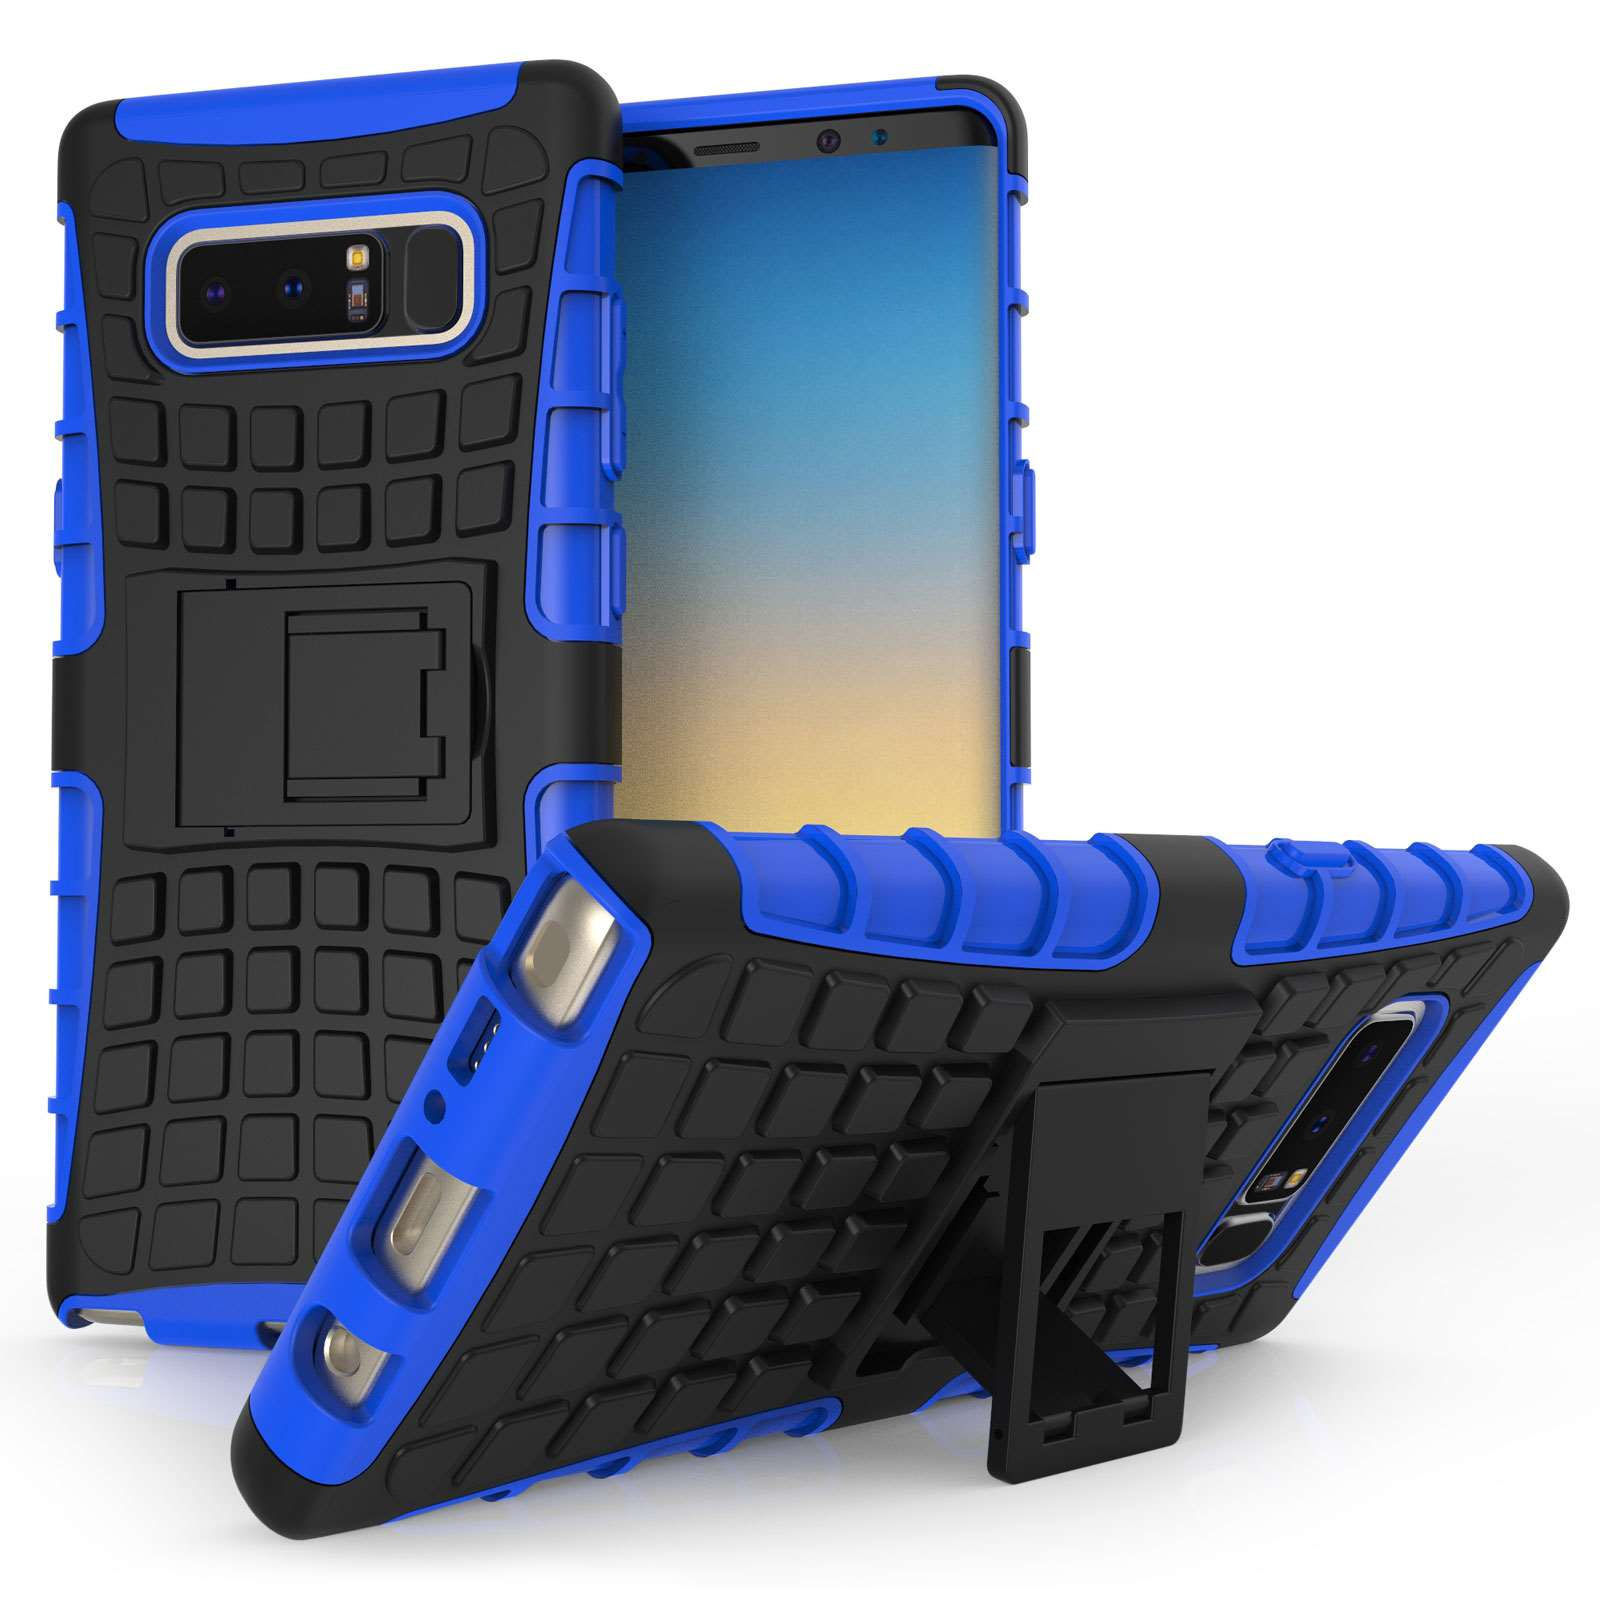 Centopi Θήκη Kickstand Combo Samsung Galaxy Note 8 - Blue (CEN-SAM-133)